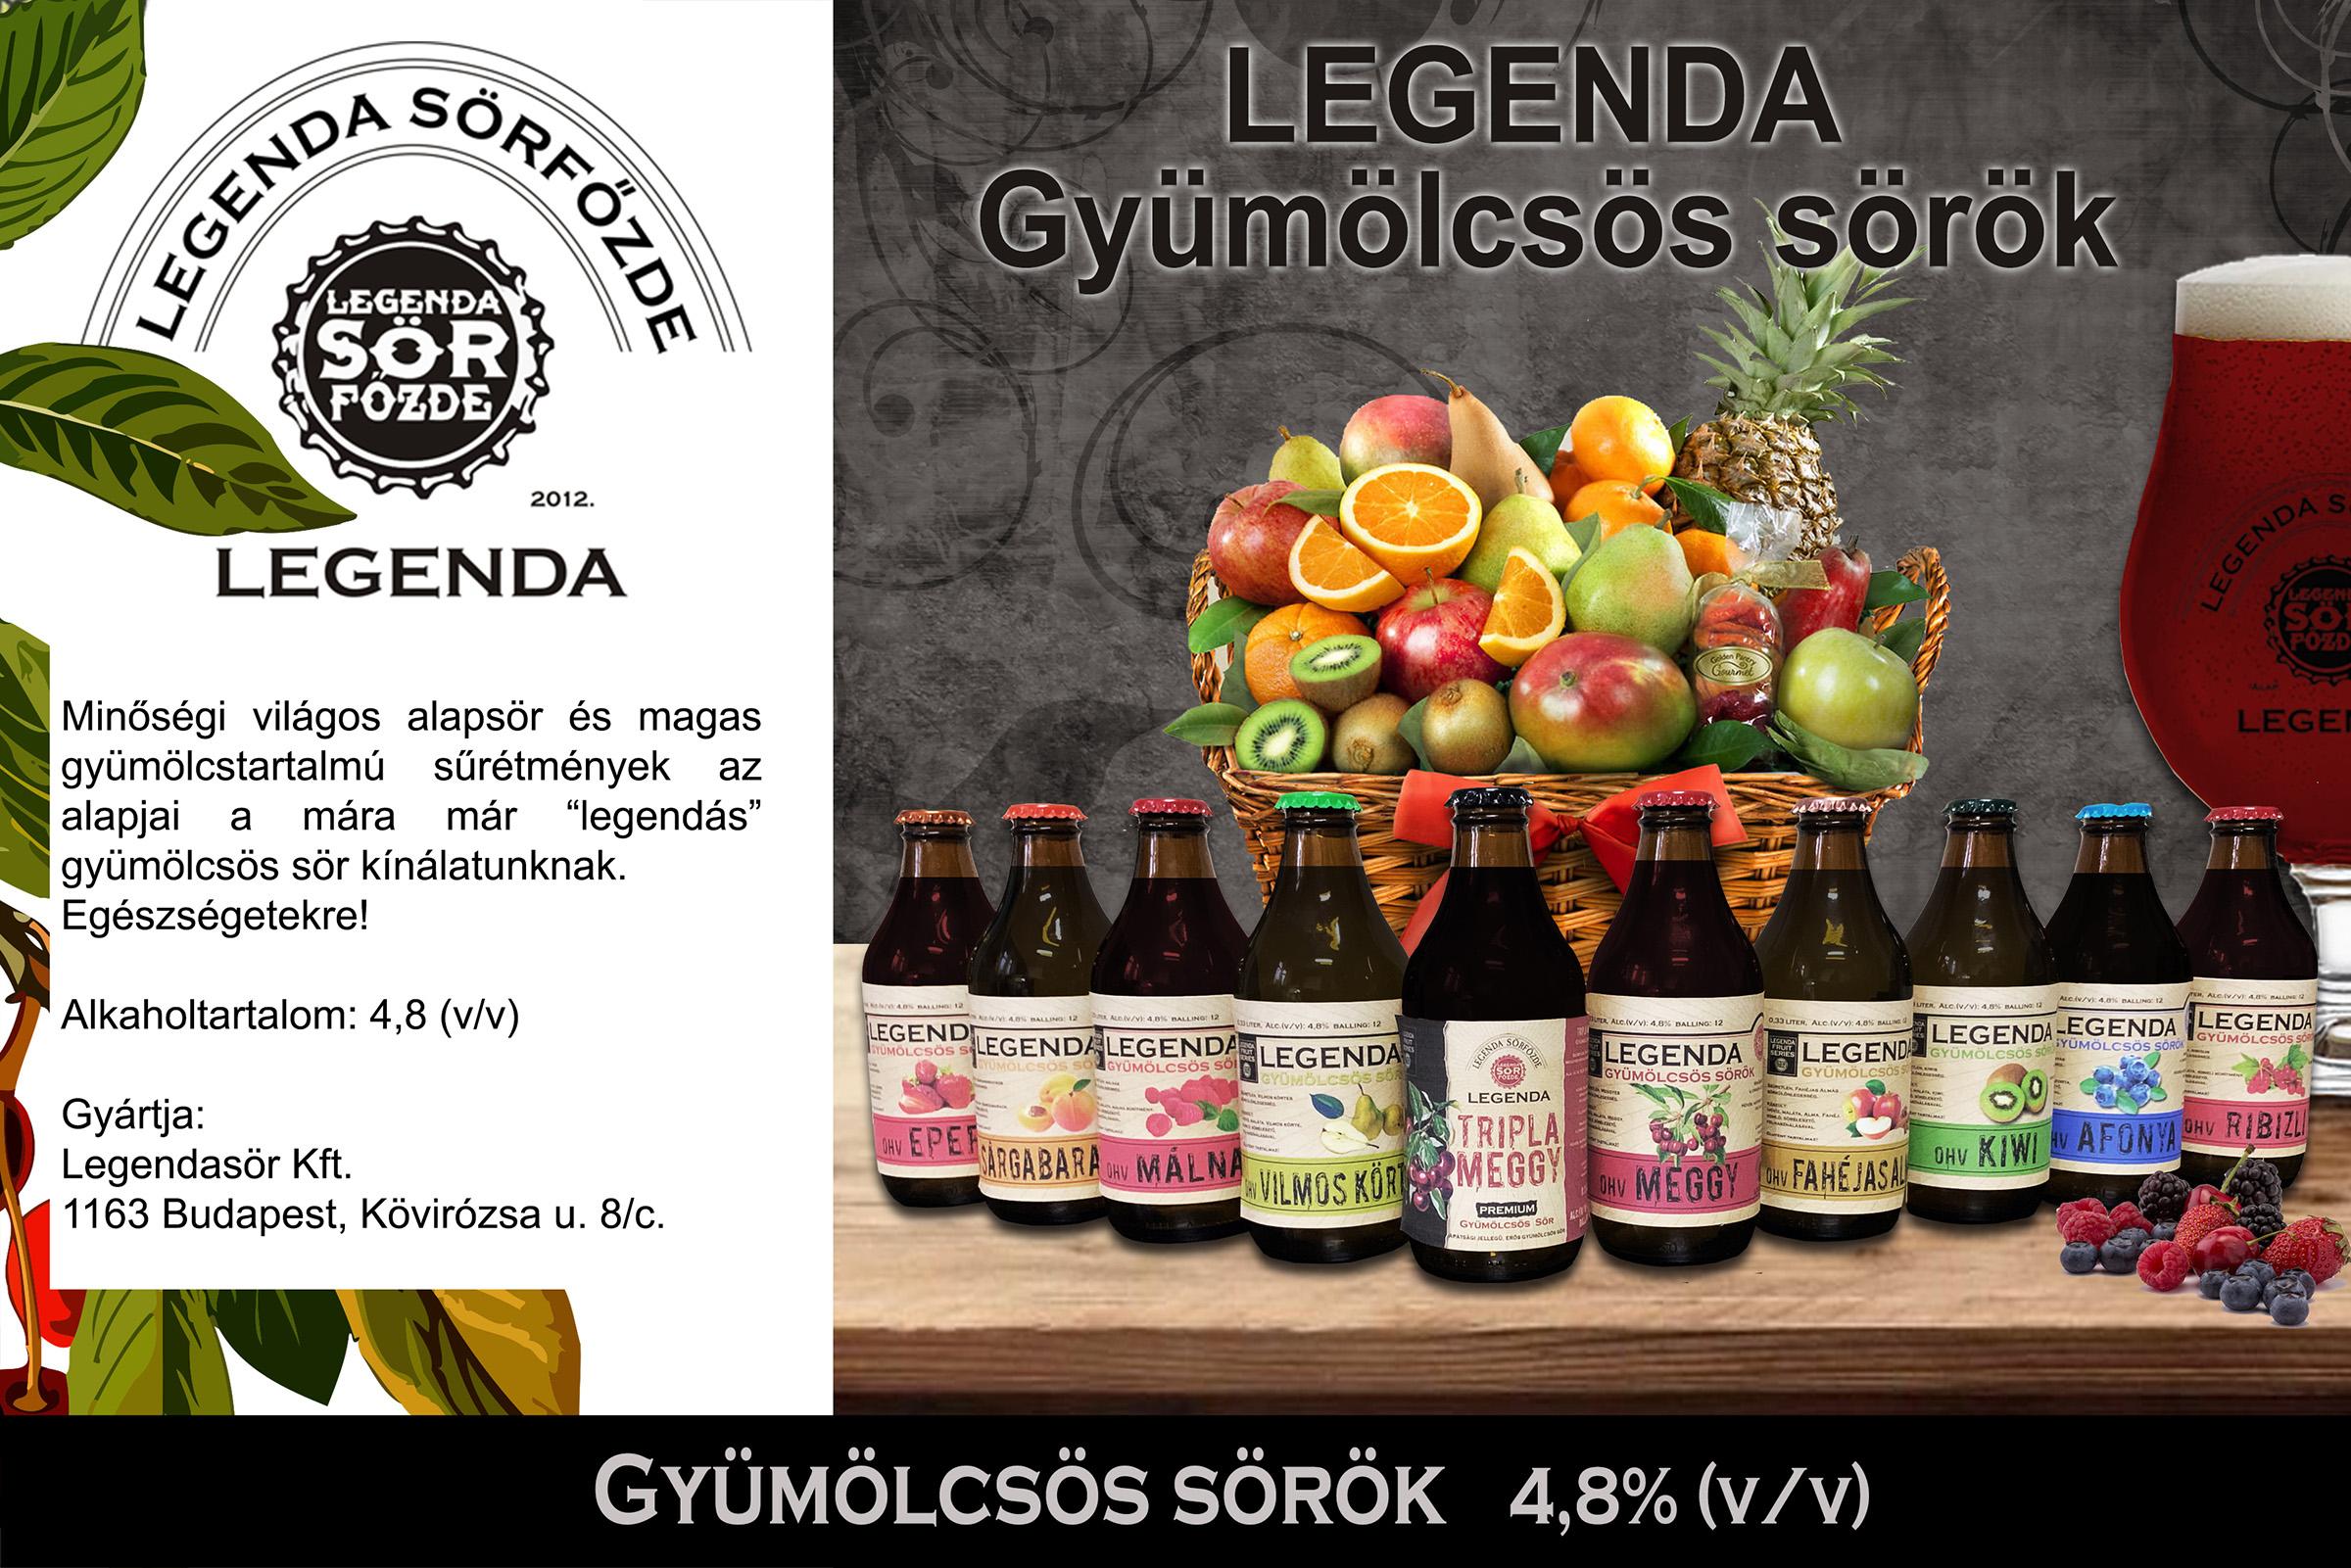 legenda_gyumolcsos_s.jpg